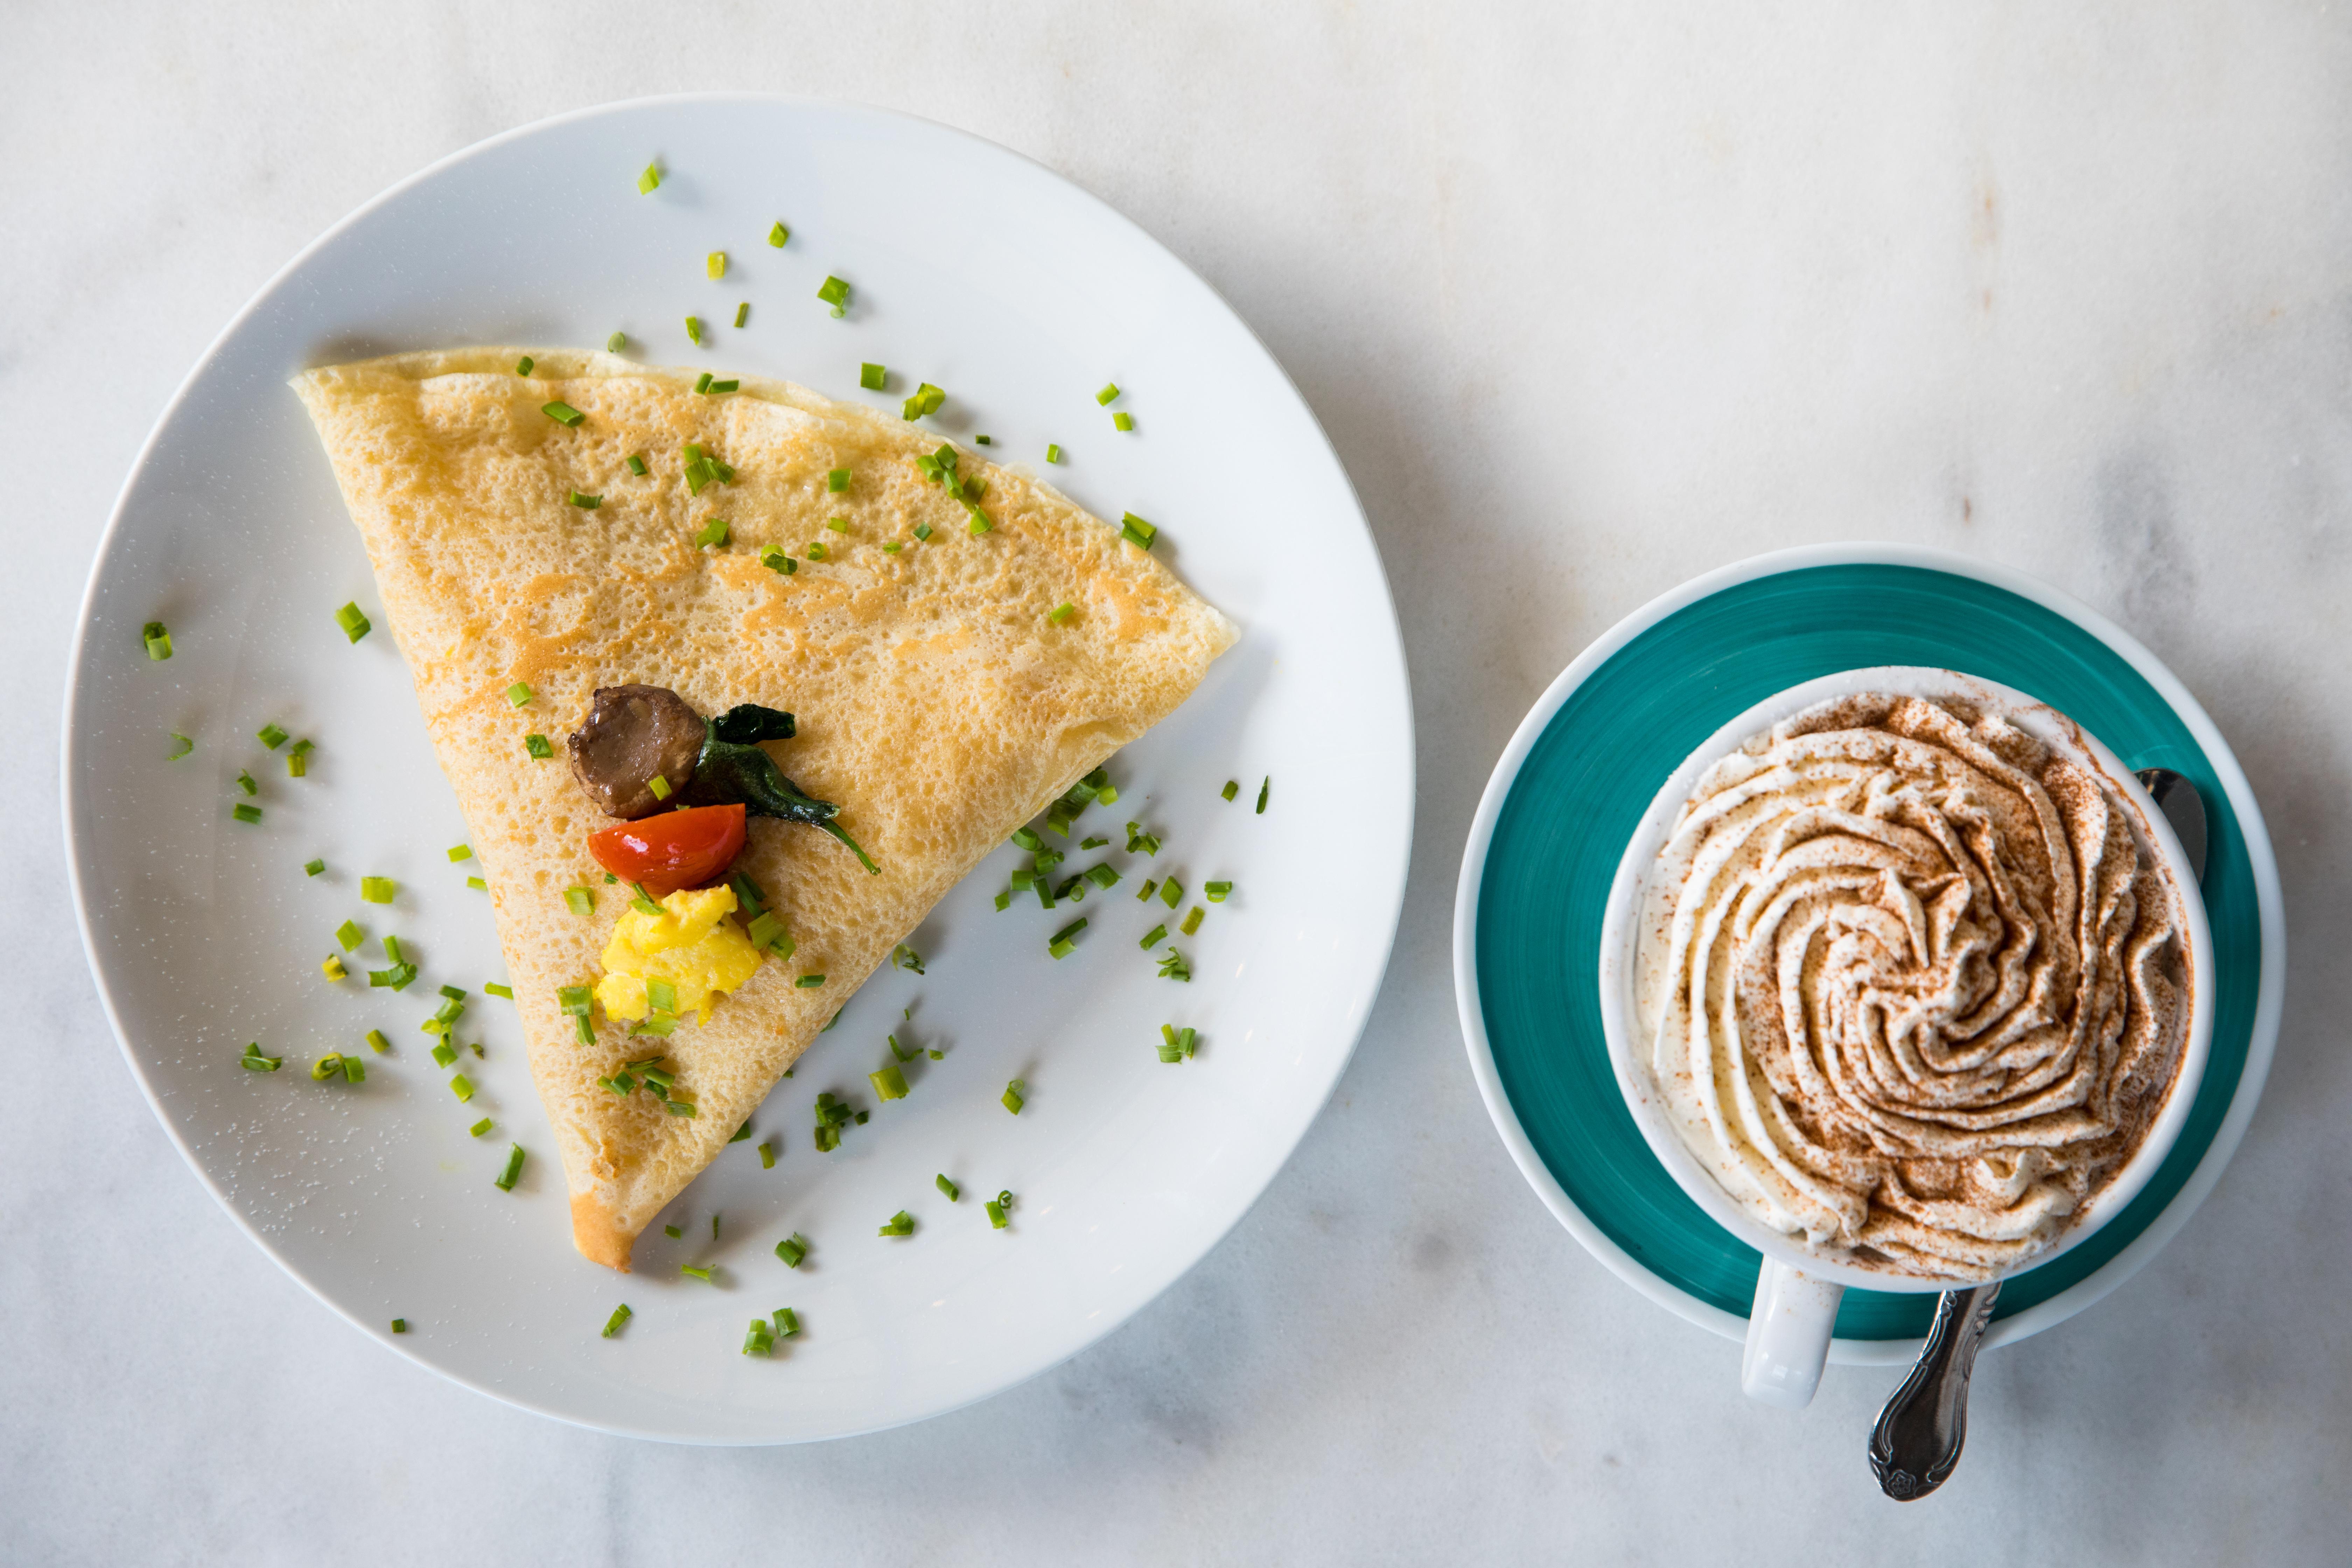 Brunch Favorite Sweet Paris Crêperie & Café Opens in The Woodlands